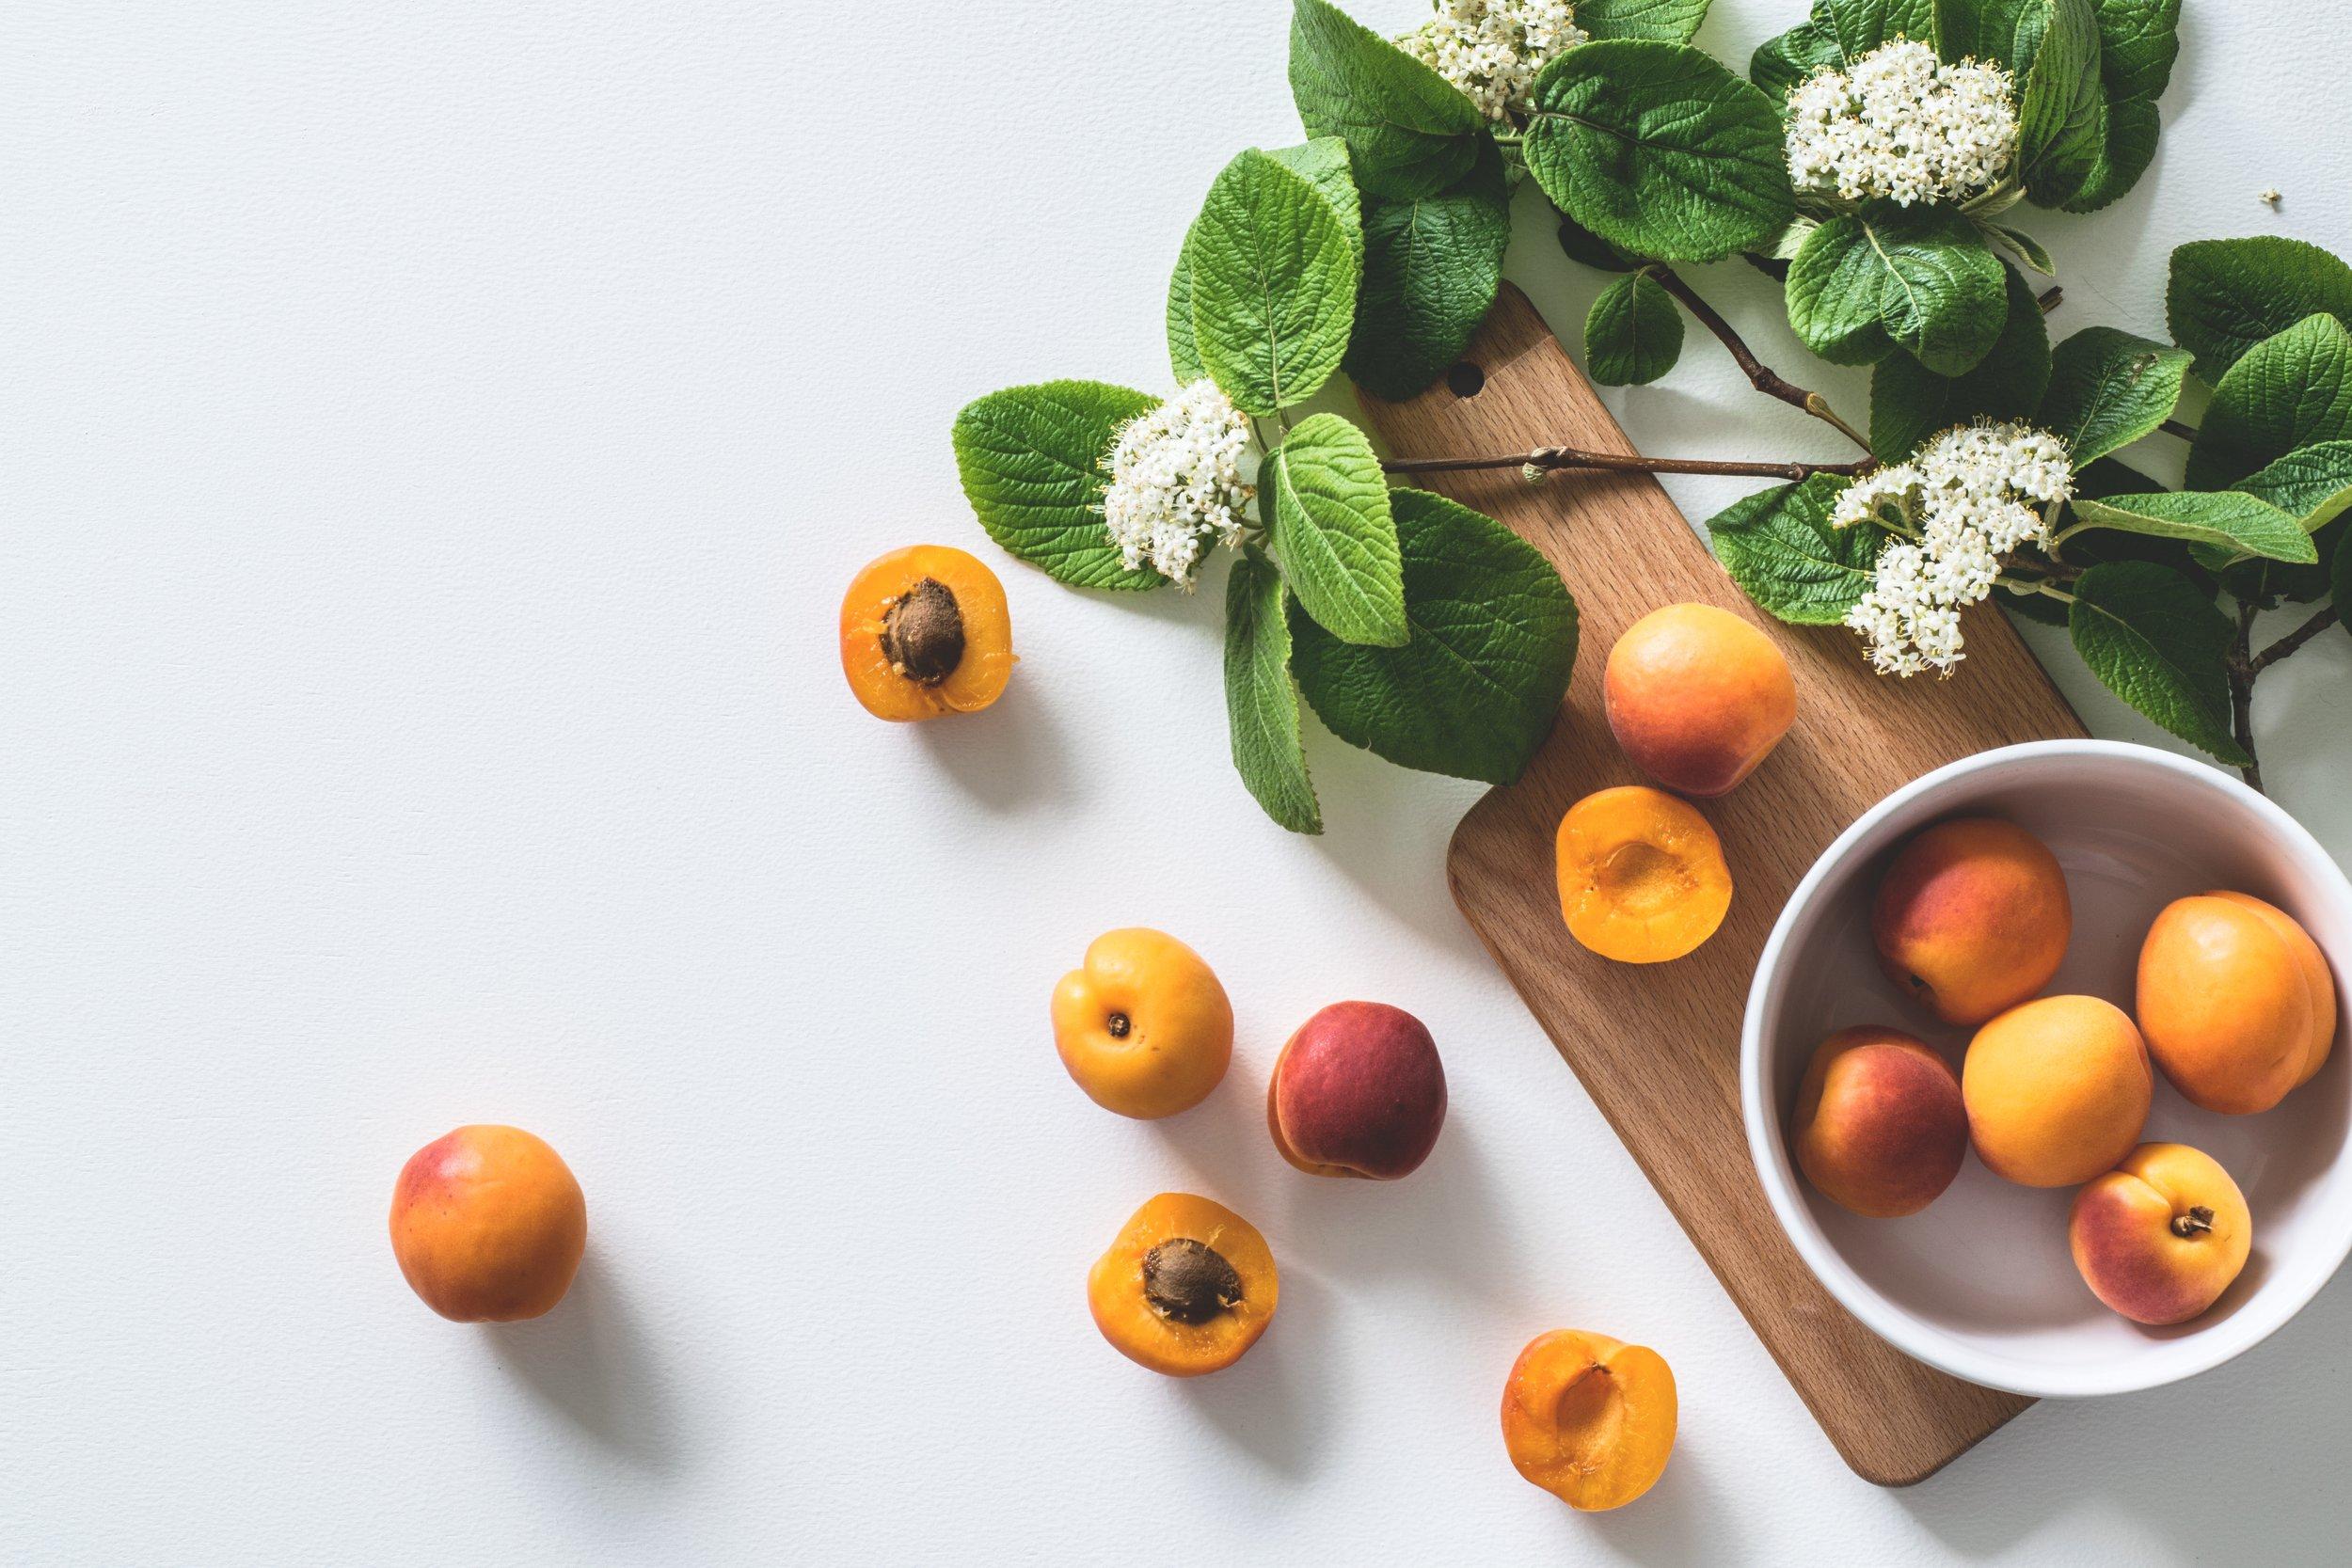 apricot-background-berry-1028599.jpg